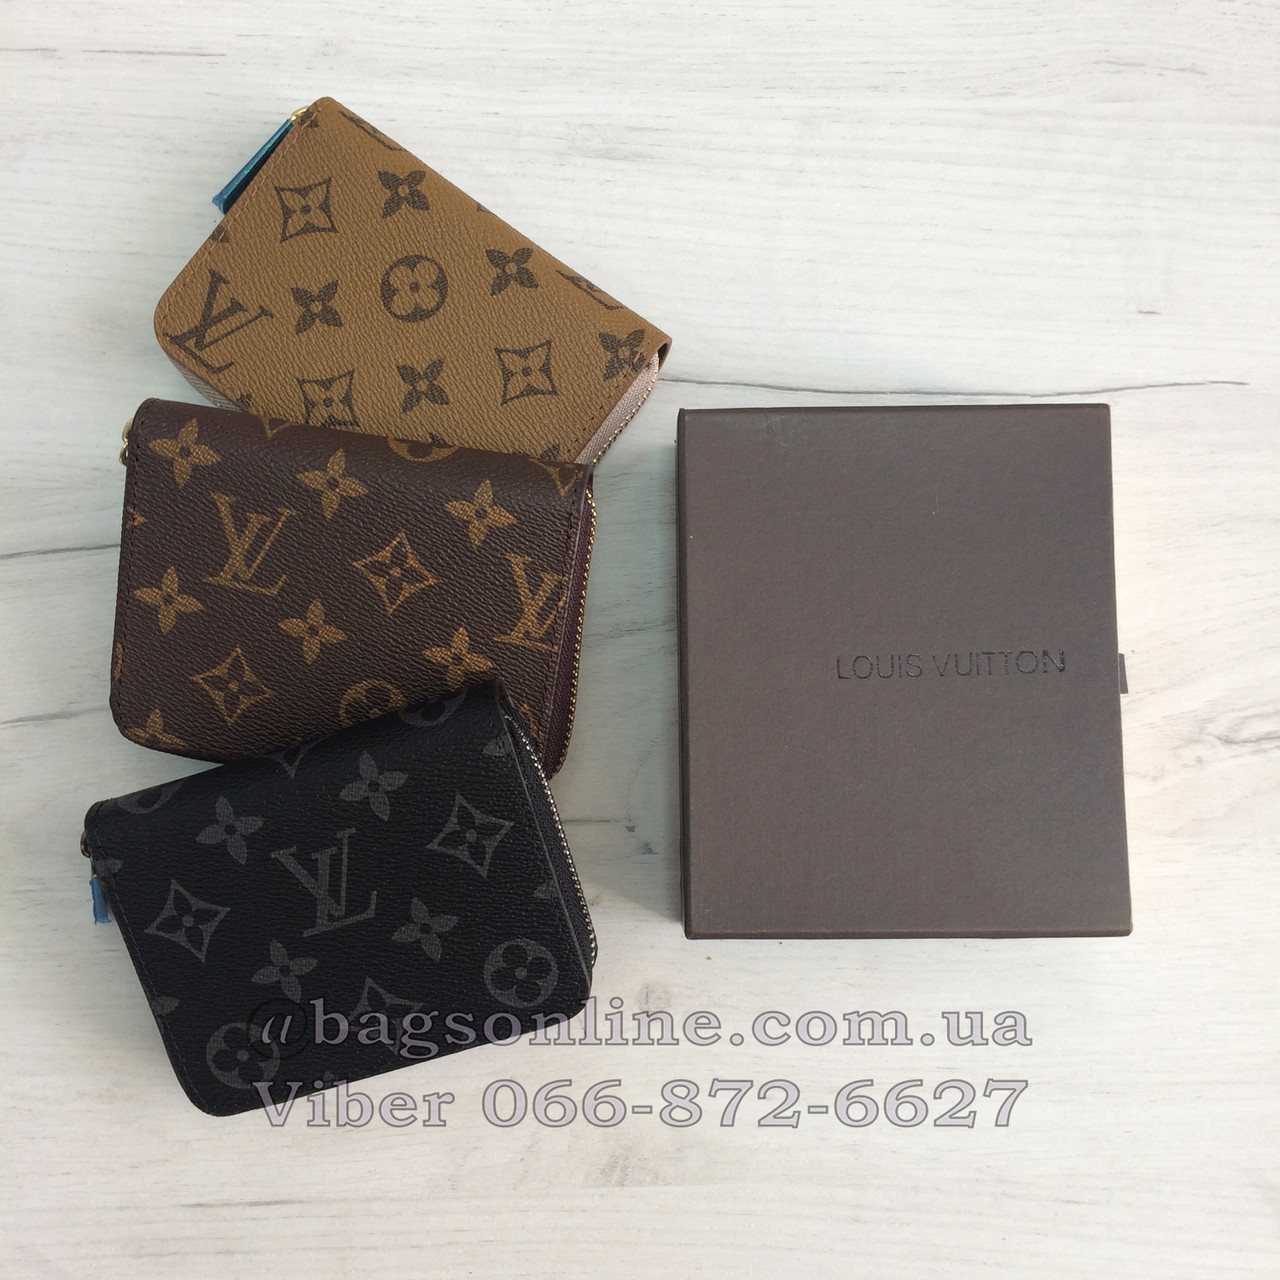 57dabf91292b Копия Кошелек Louis Vuitton Мини на молнии   LV канва   реплика Луи Витон  маленький -